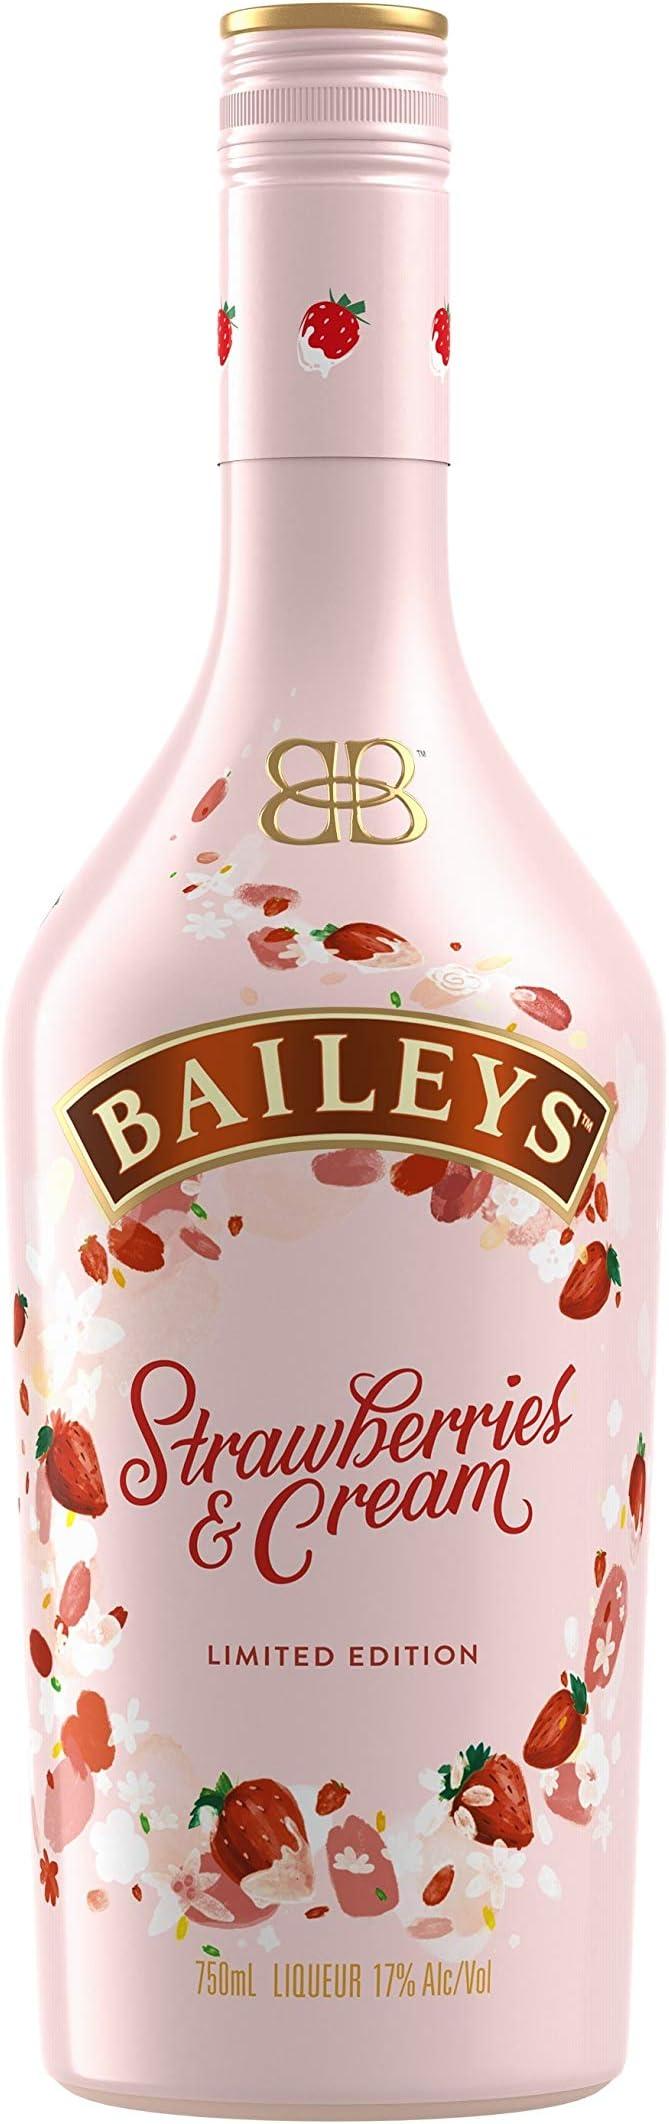 Baileys Strawberry & Cream, 700ml